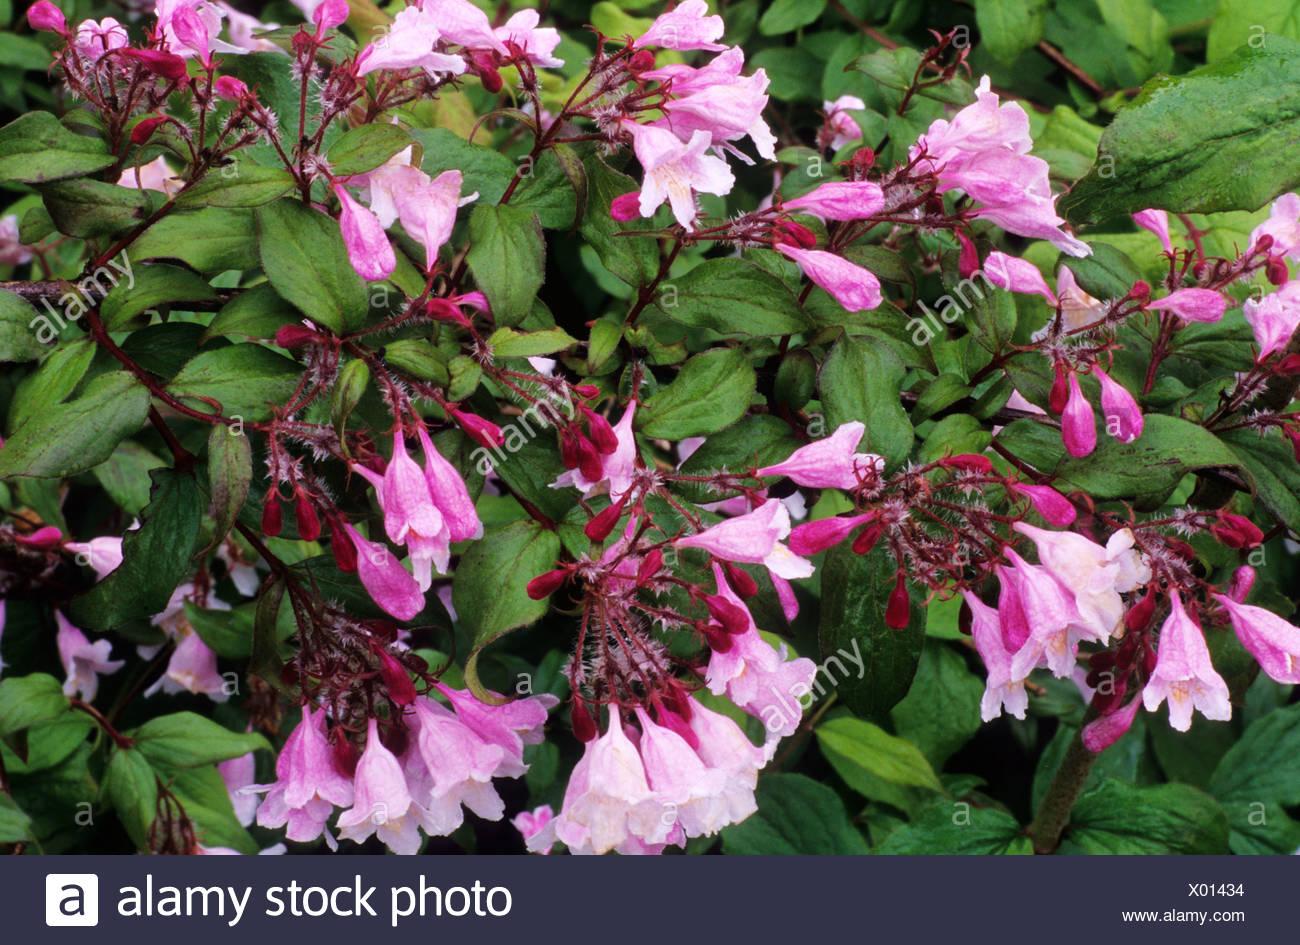 Kolkwitzia Amabilis Pink Cloud Beauty Bush Pink Flowers Garden